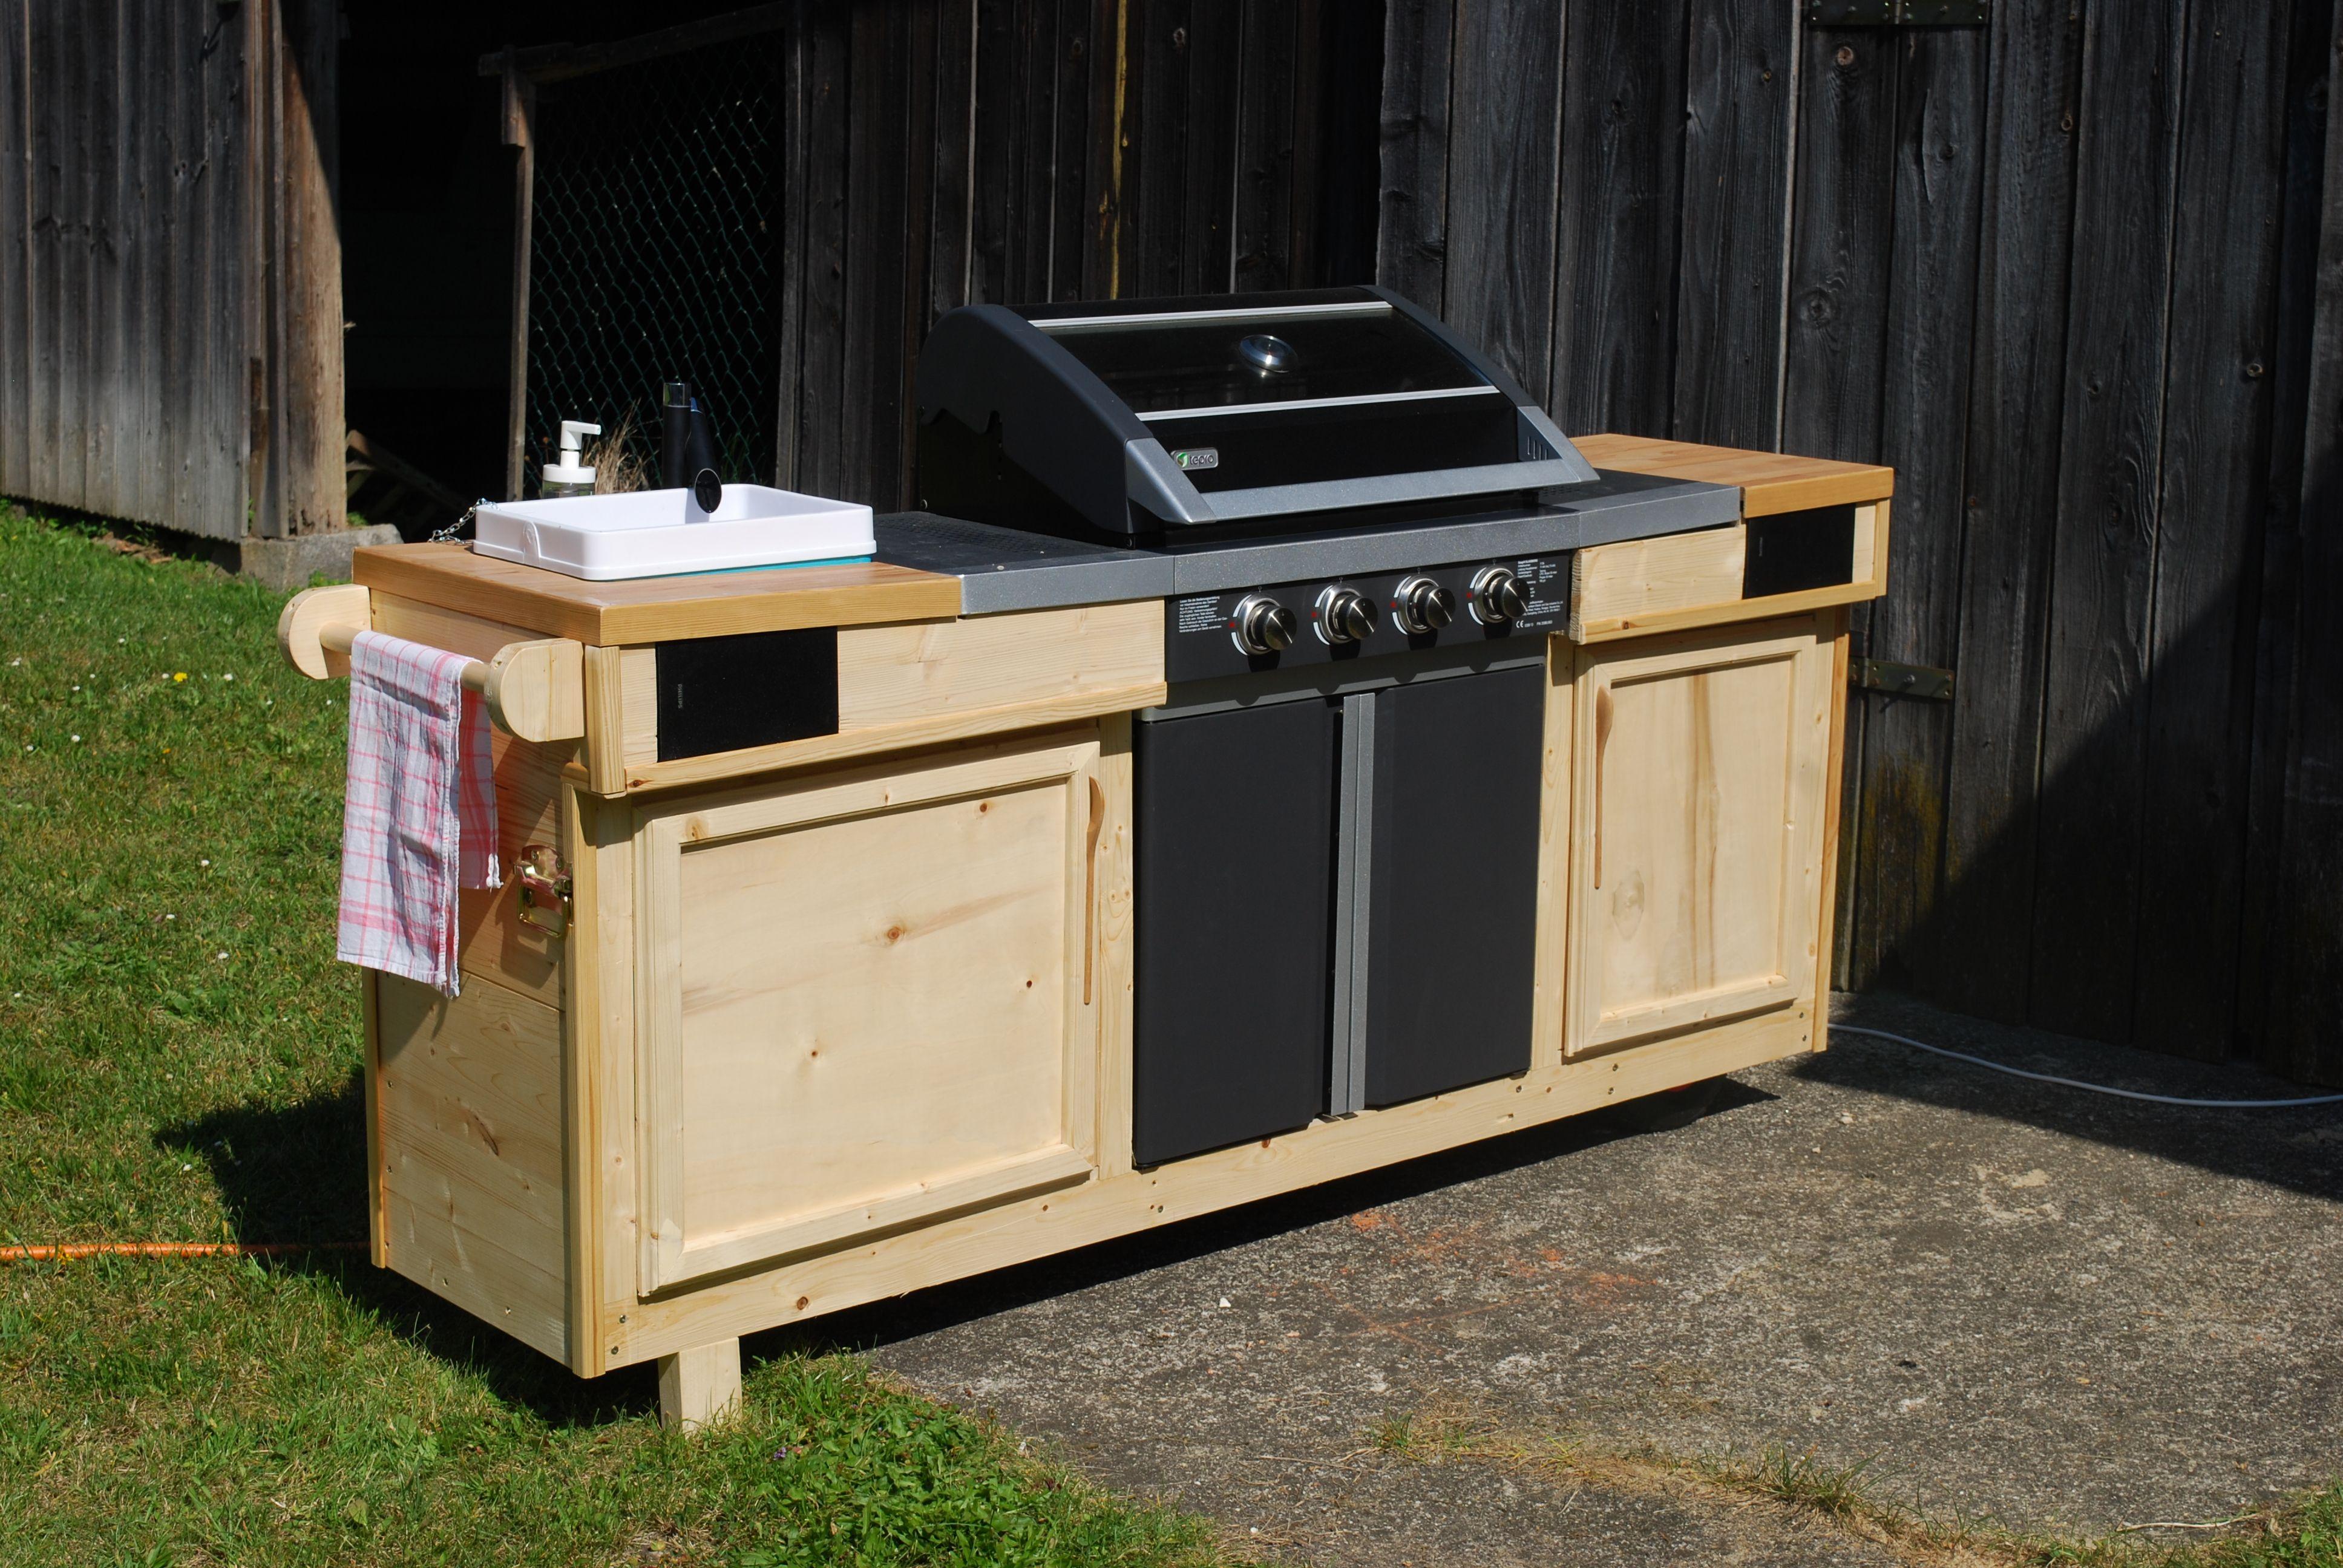 Fertige Outdoor Küche Diy Outdoorküche Ikea Hack Rut Morawetz